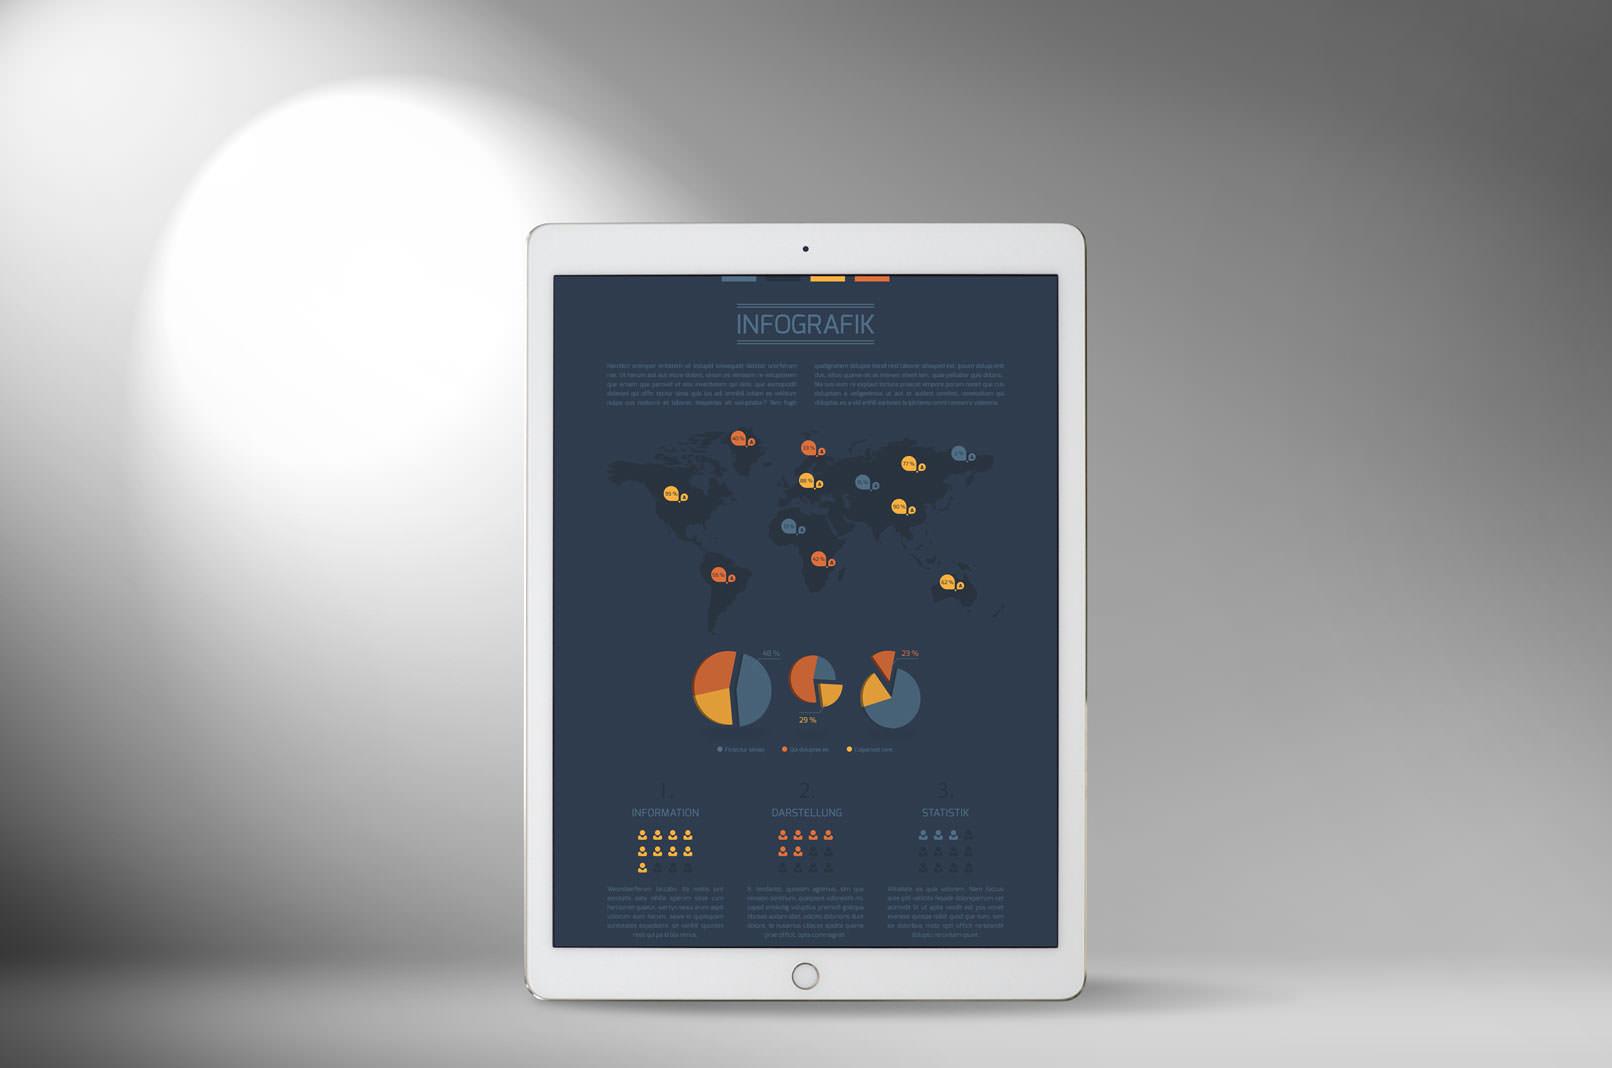 Spotlight-Bild mit Infografik